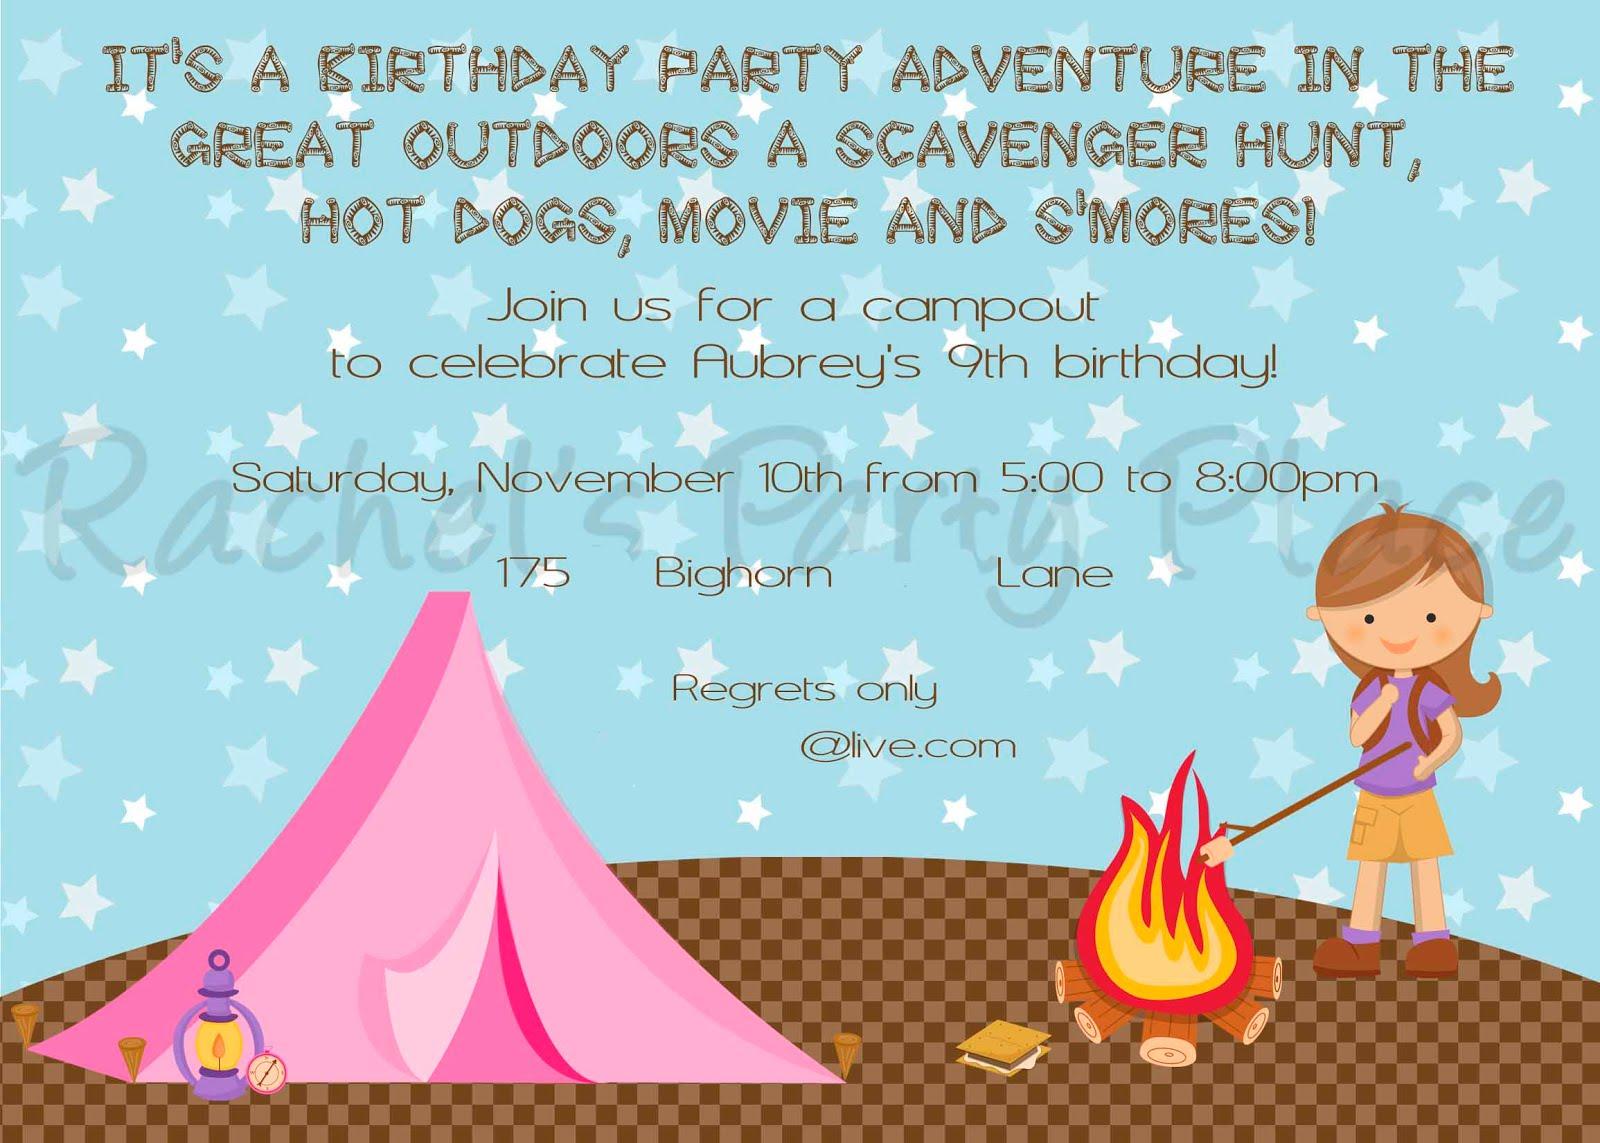 Shabby Chic Invitation was great invitations ideas